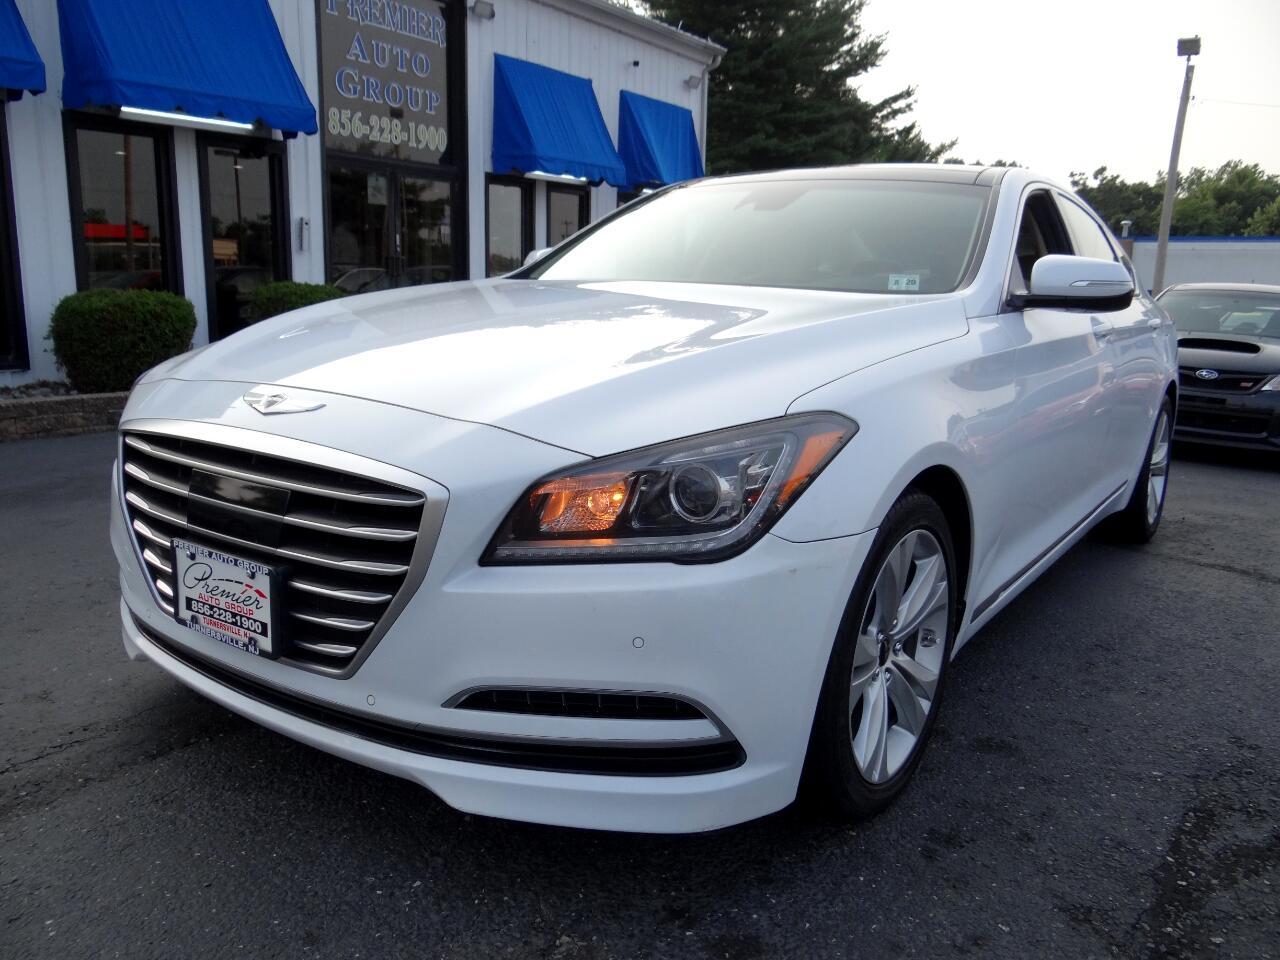 2015 Hyundai Genesis 4dr Sdn V6 3.8L RWD